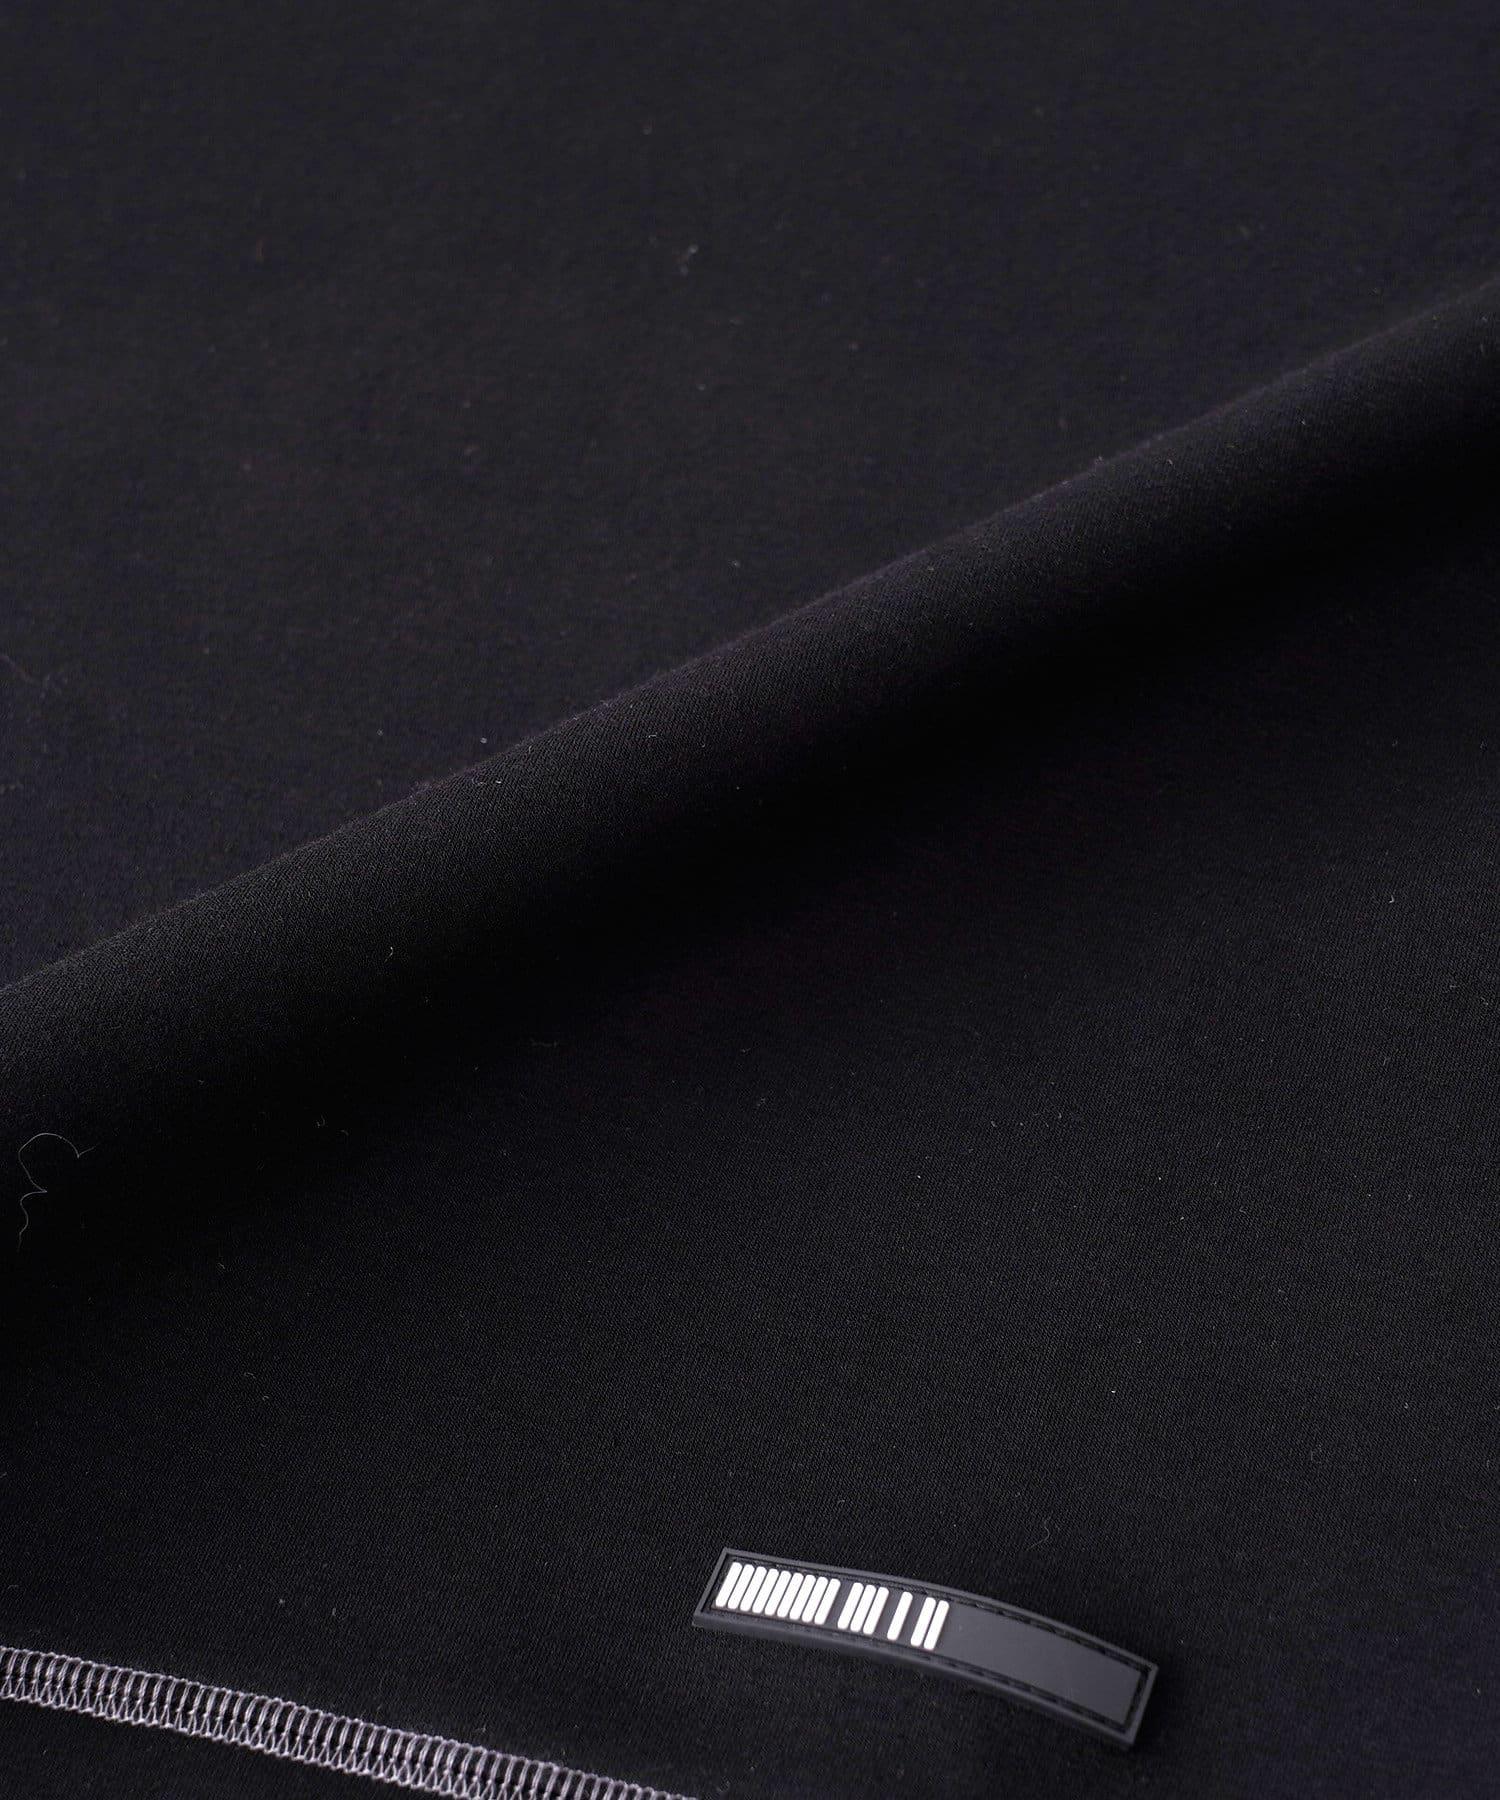 COLONY 2139(コロニー トゥーワンスリーナイン) ダンボールドルマンスリーブTシャツ/配色ステッチビッグシルエットT